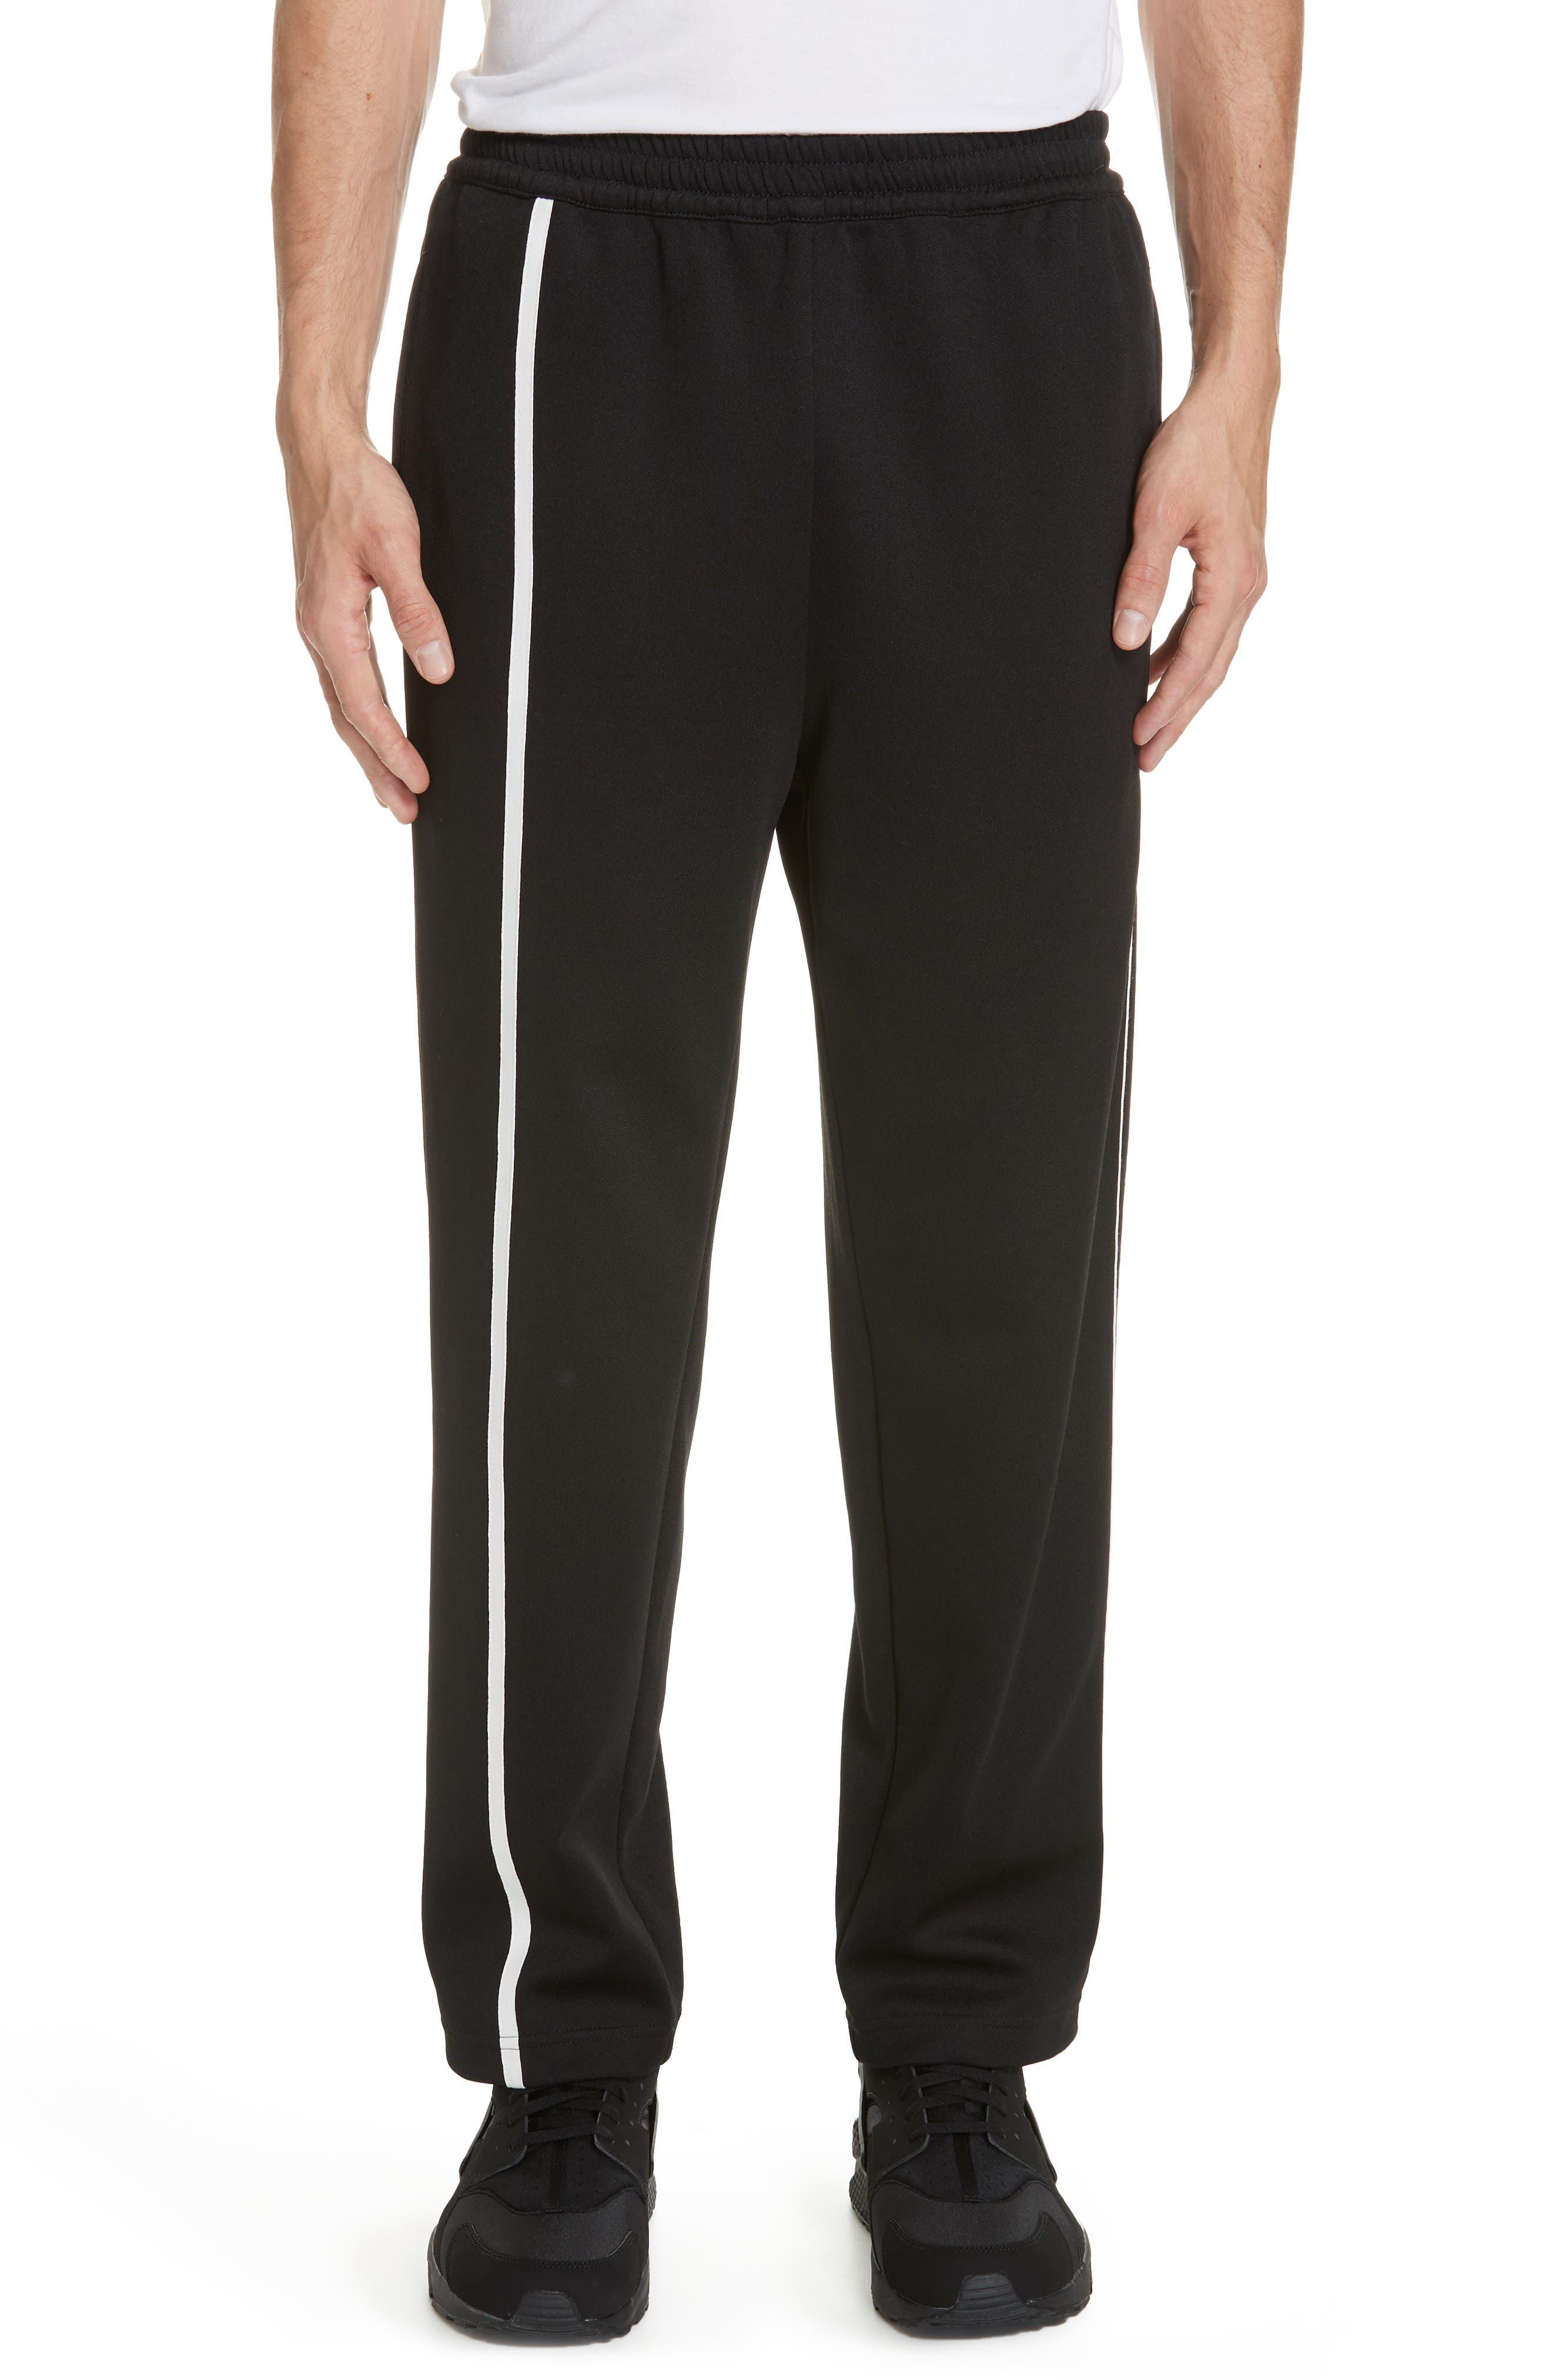 HELMUT LANG, Sport Stripe Sweatpants, Main thumbnail 1, color, BLACK AND WHITE